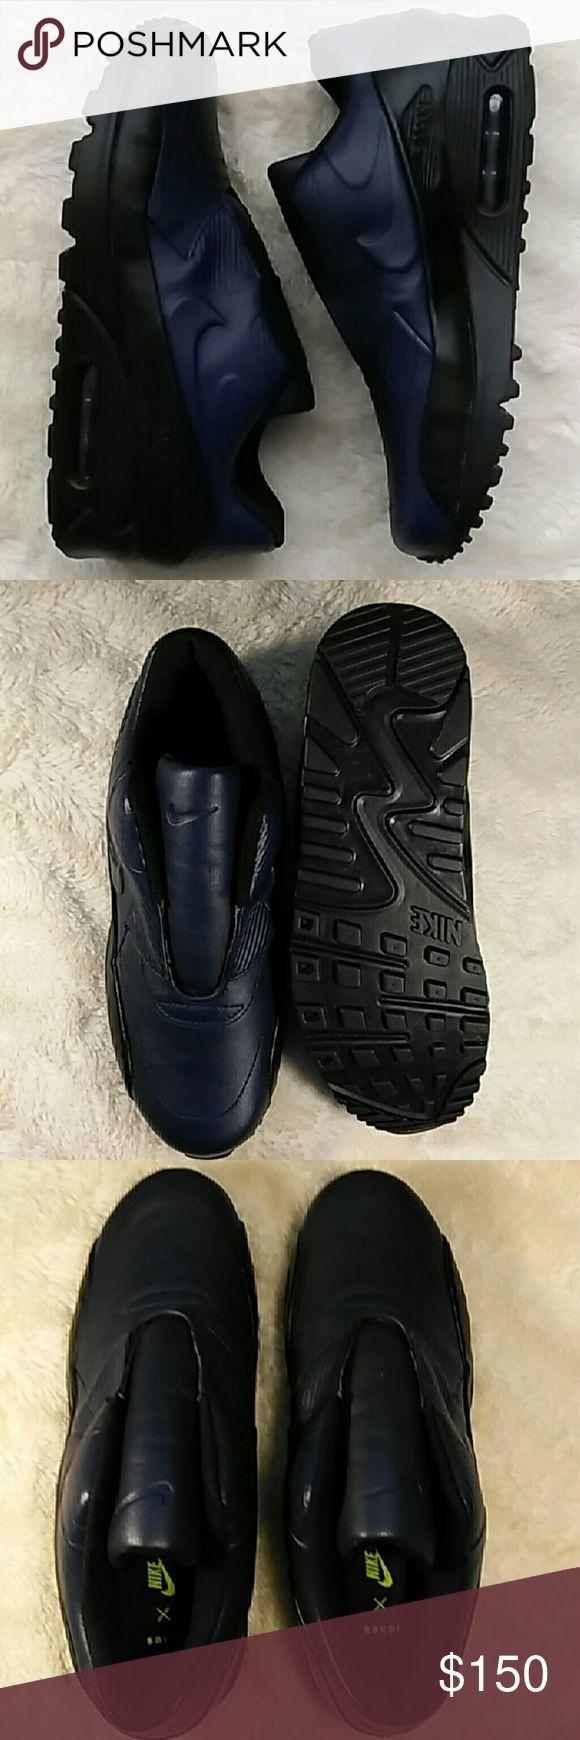 "Nike Air Max 90 ""nikelab"" Sp/sacai Obsidian/black Brand new Nike Air Max 90 ""nikelab"" Sp/sacai Obsidian/black with not original box. Nike Shoes Sneakers"